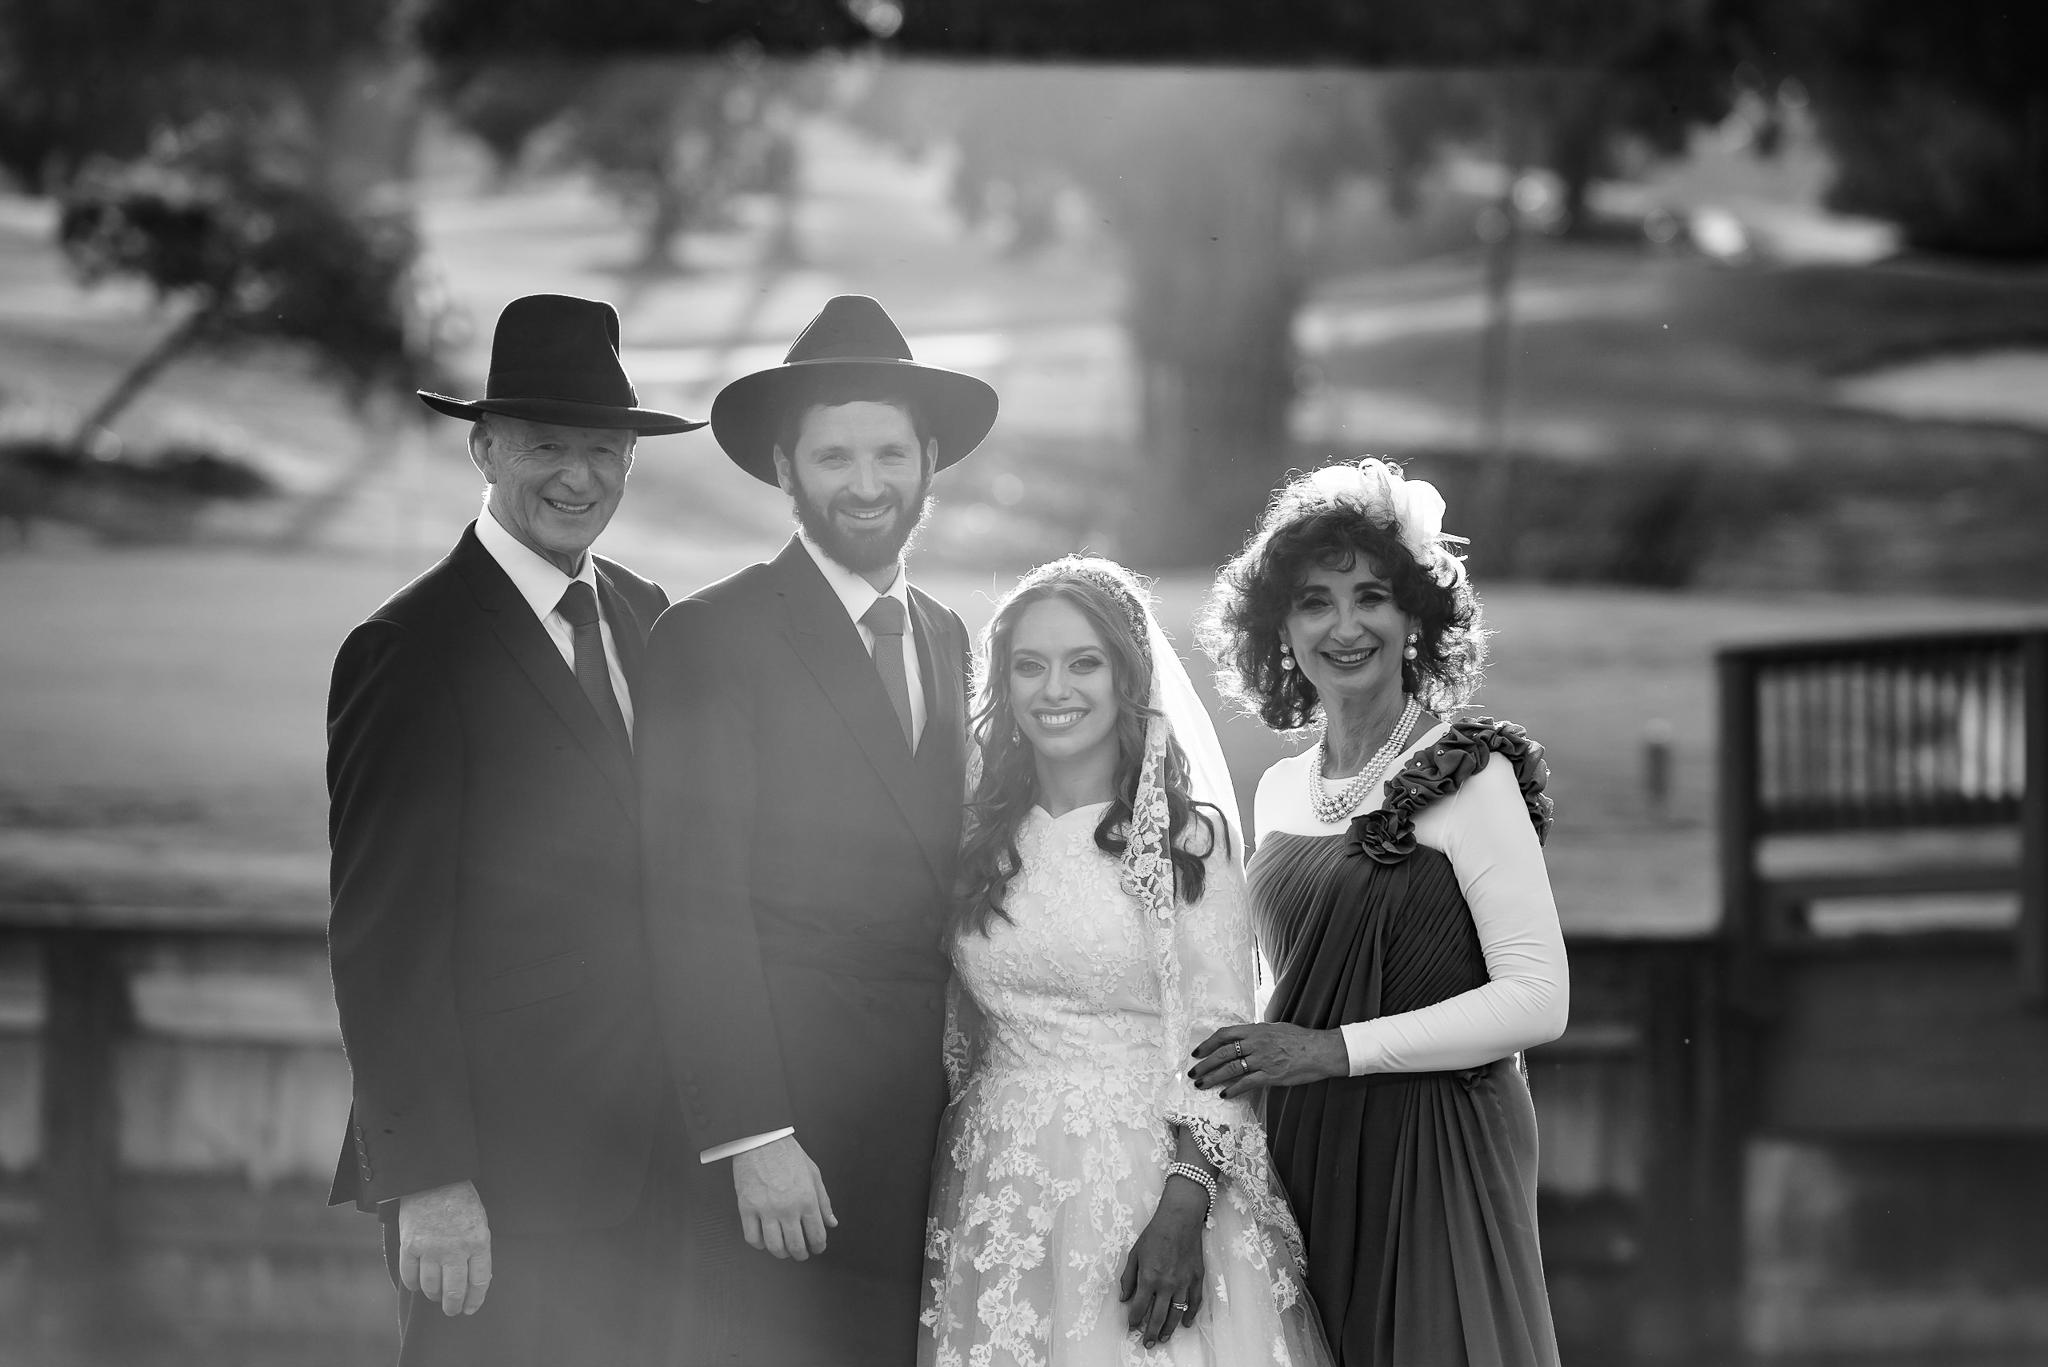 Wedding by Levikfoto.com-032.jpg